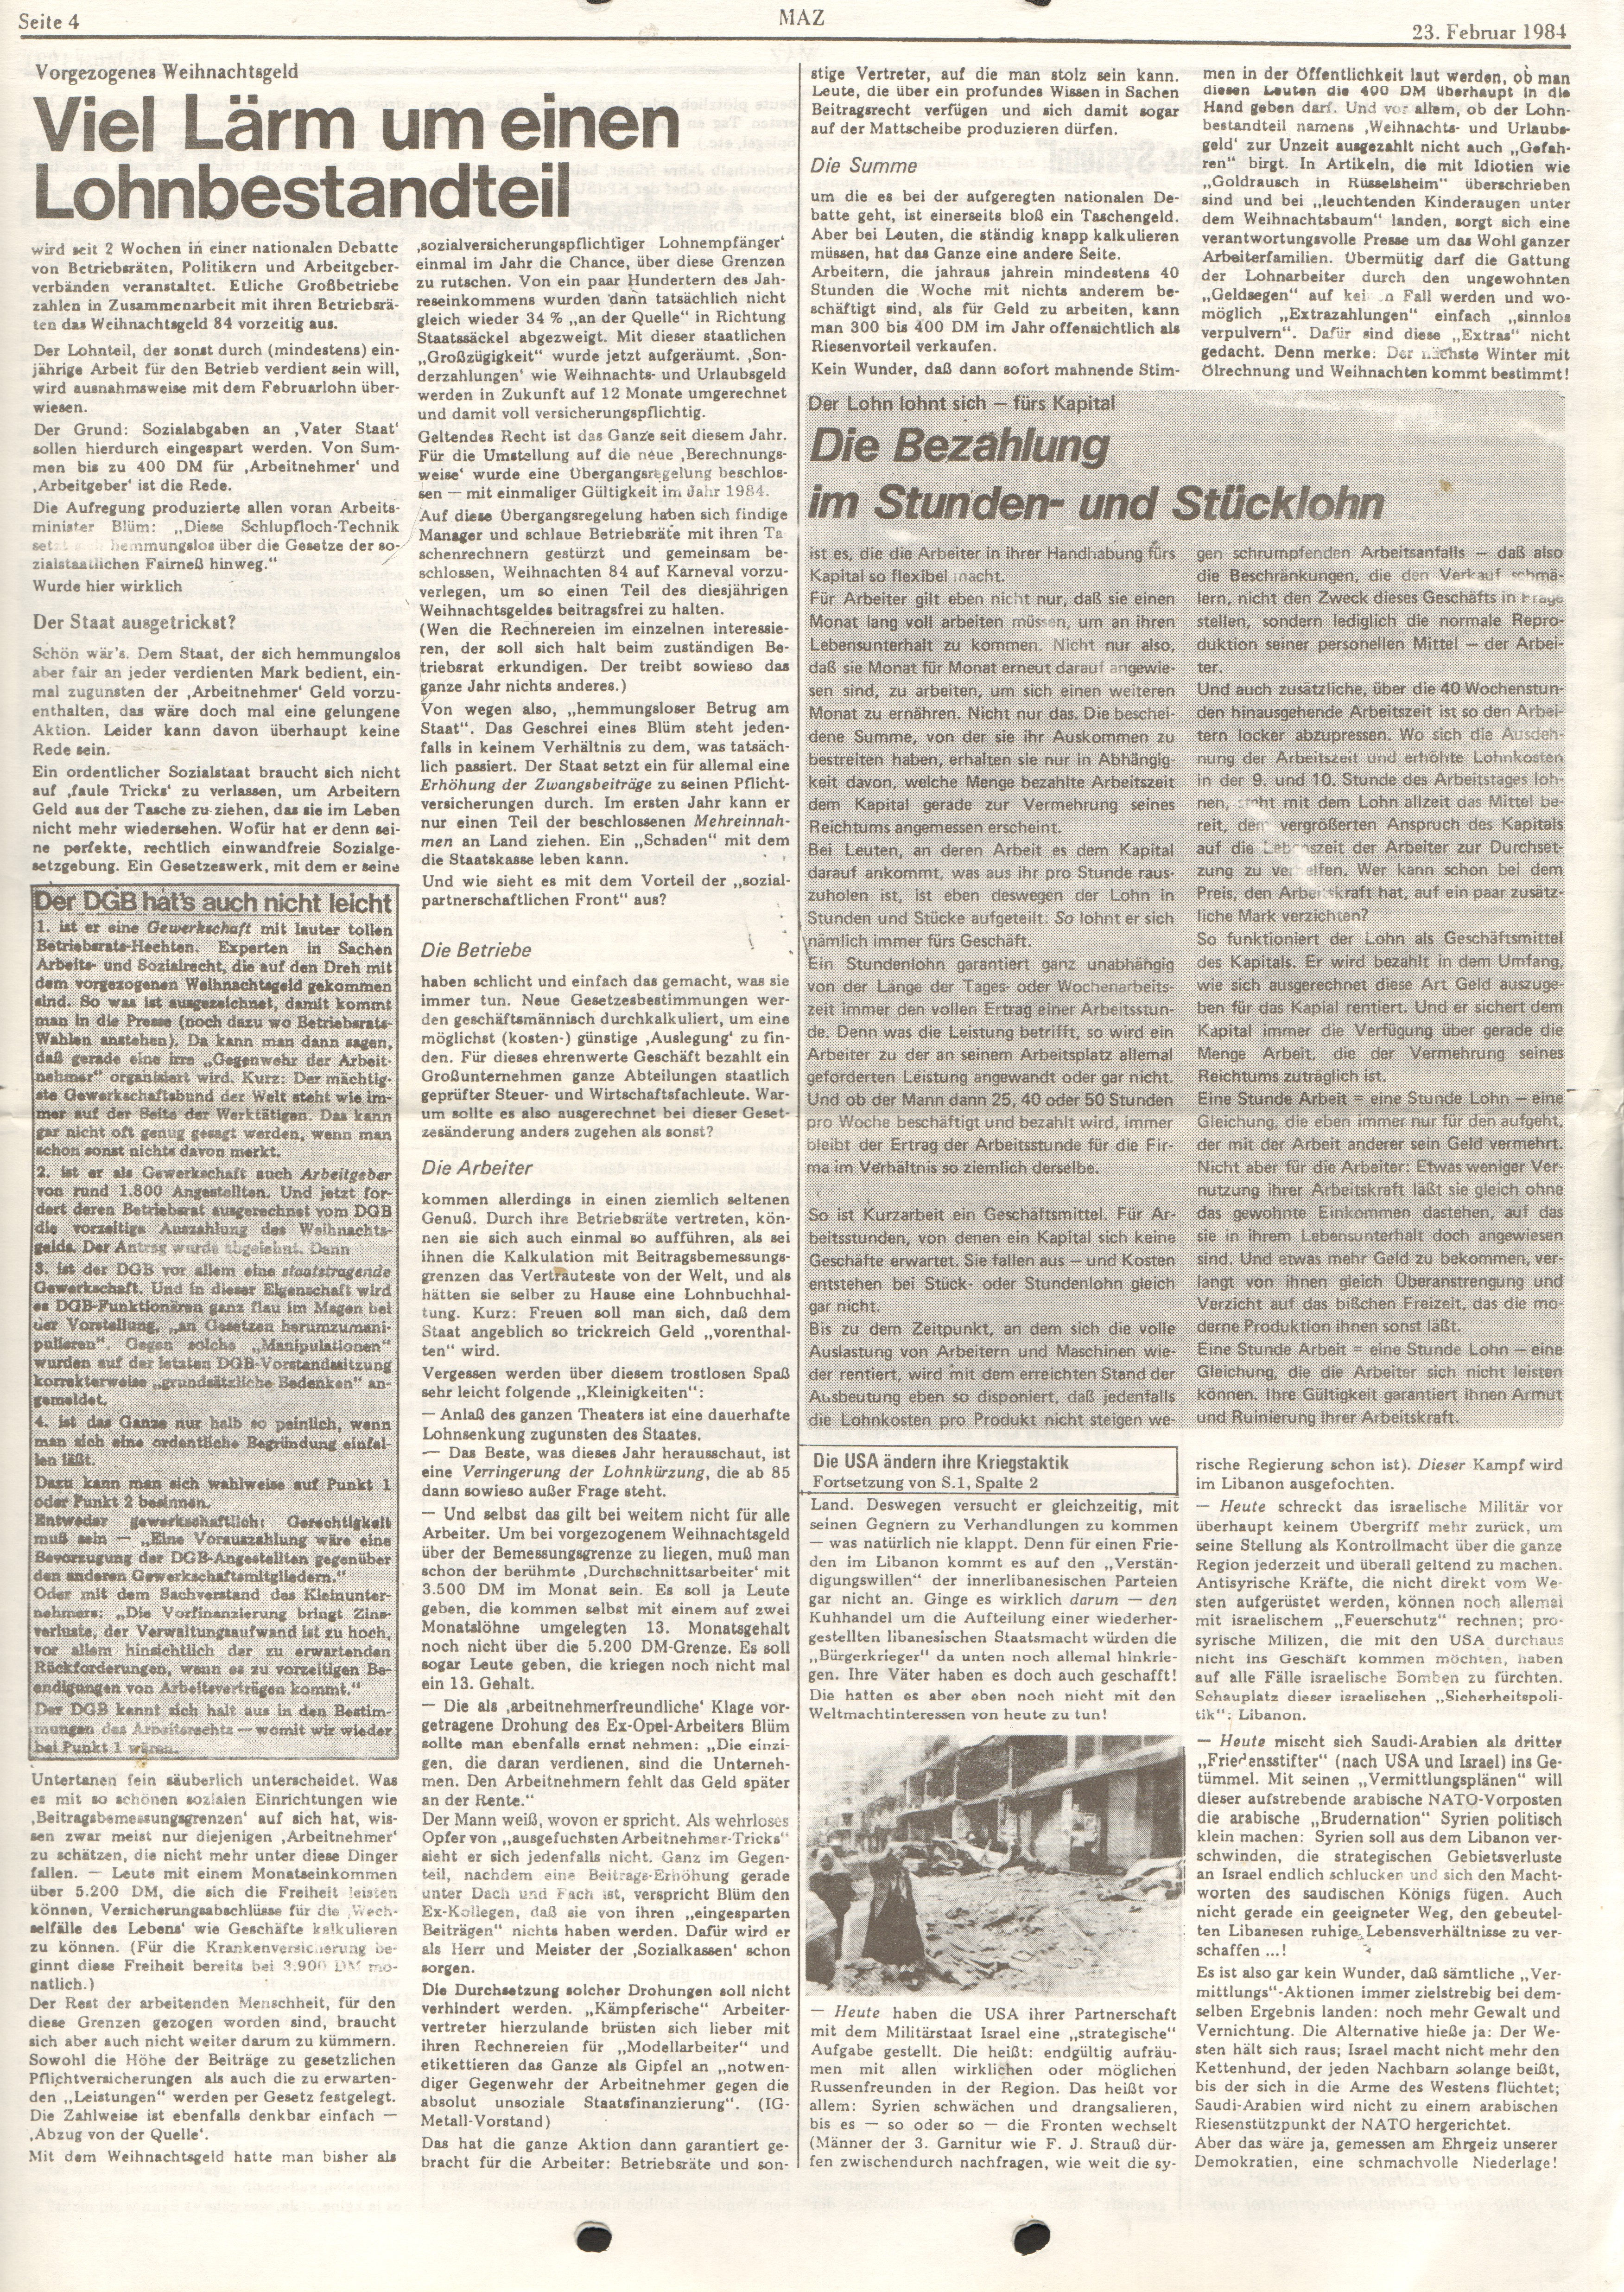 Nuernberg_MG_MAZ_Siemens_19840223_04